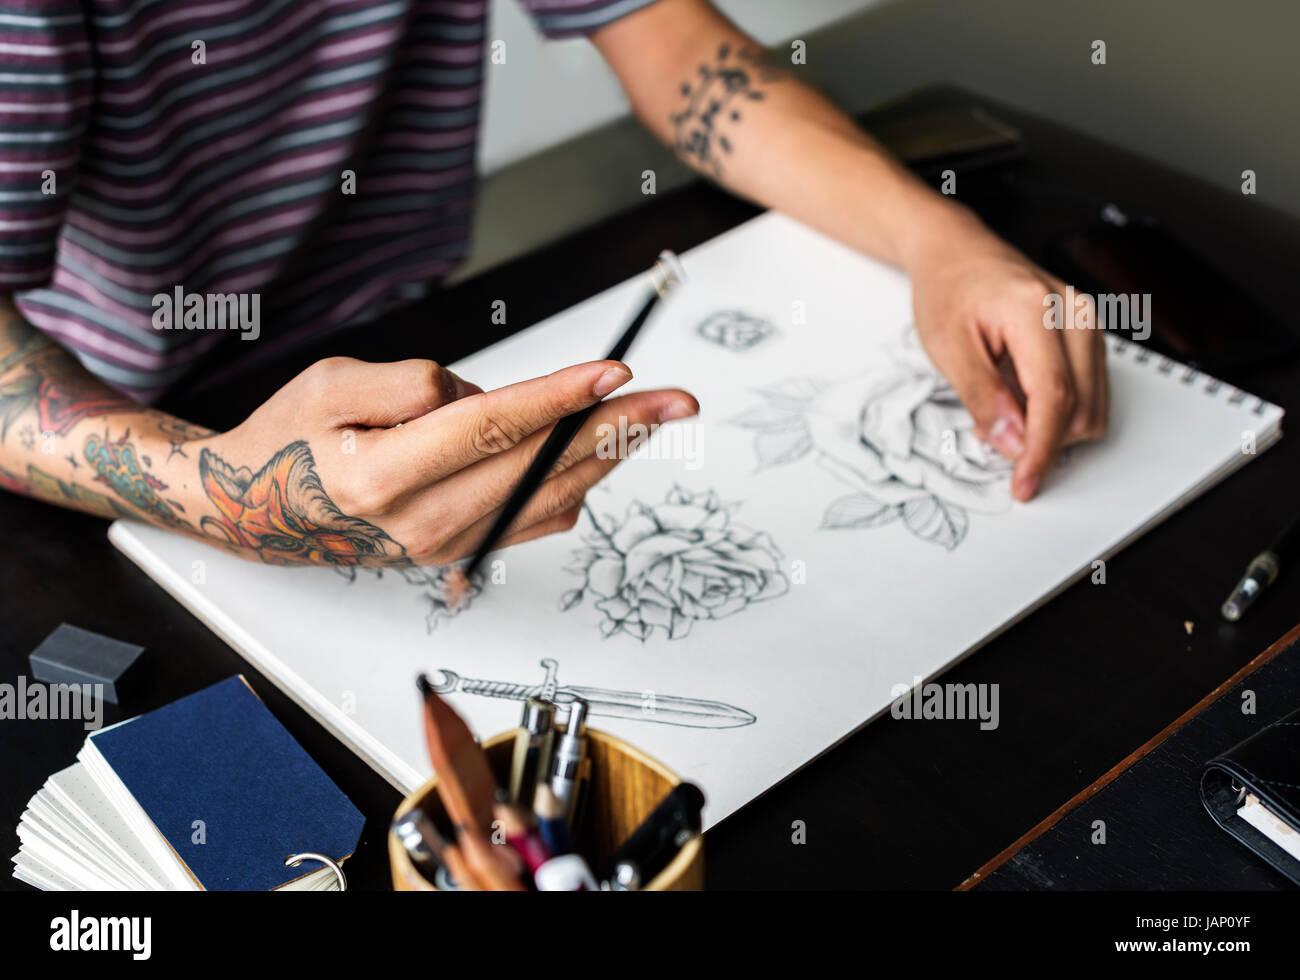 bddee6680 Closeup of tattooed hand with drawing artwork Stock Photo: 144313219 ...